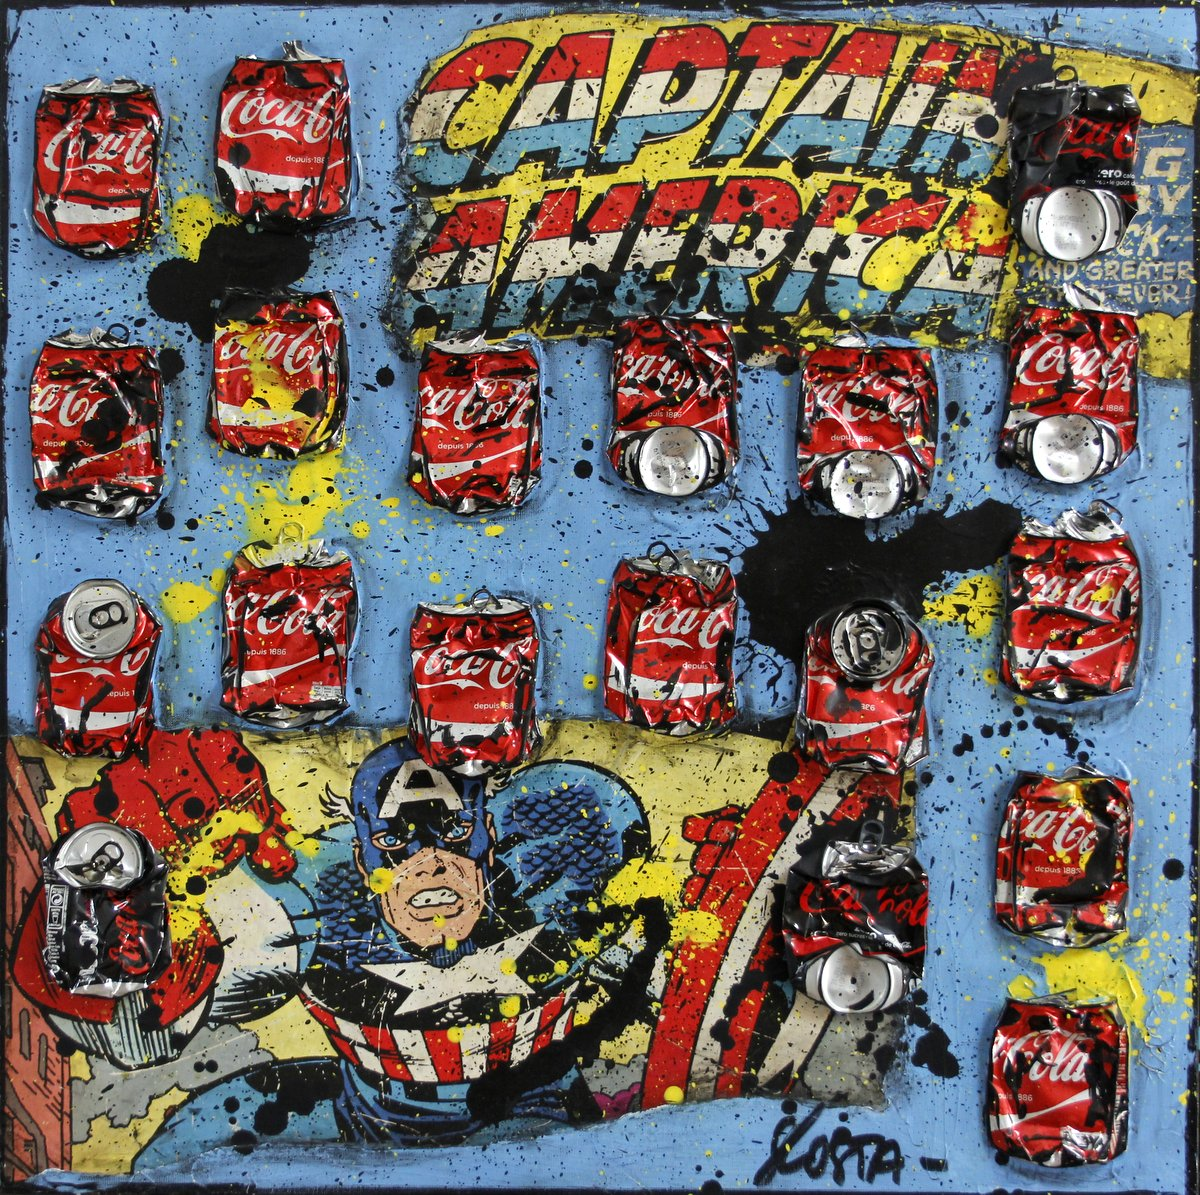 comics, collage Tableau Contemporain, CAPTAIN AMERICA. Sophie Costa, artiste peintre.